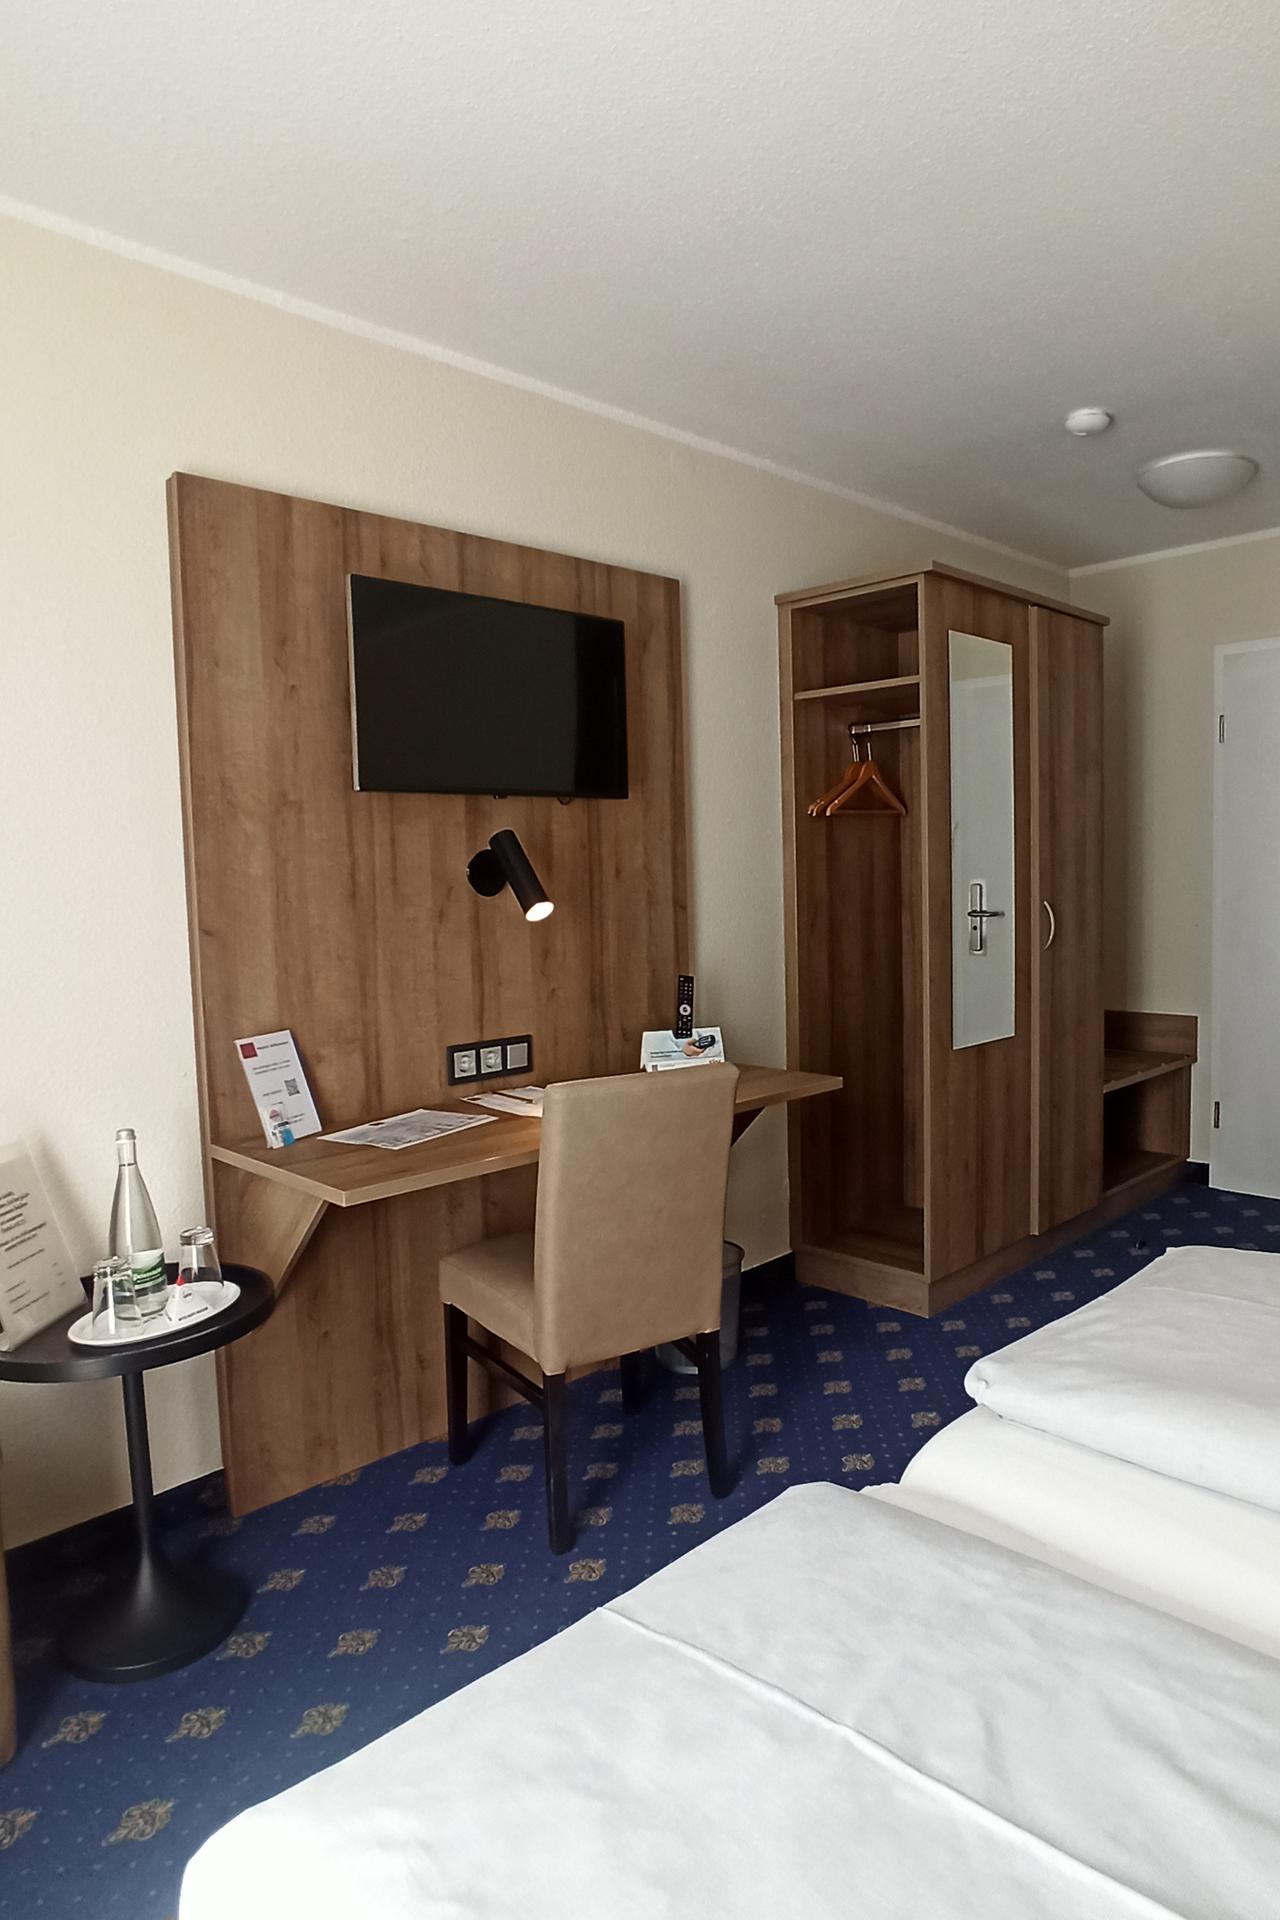 Hotel Arcis DZ D